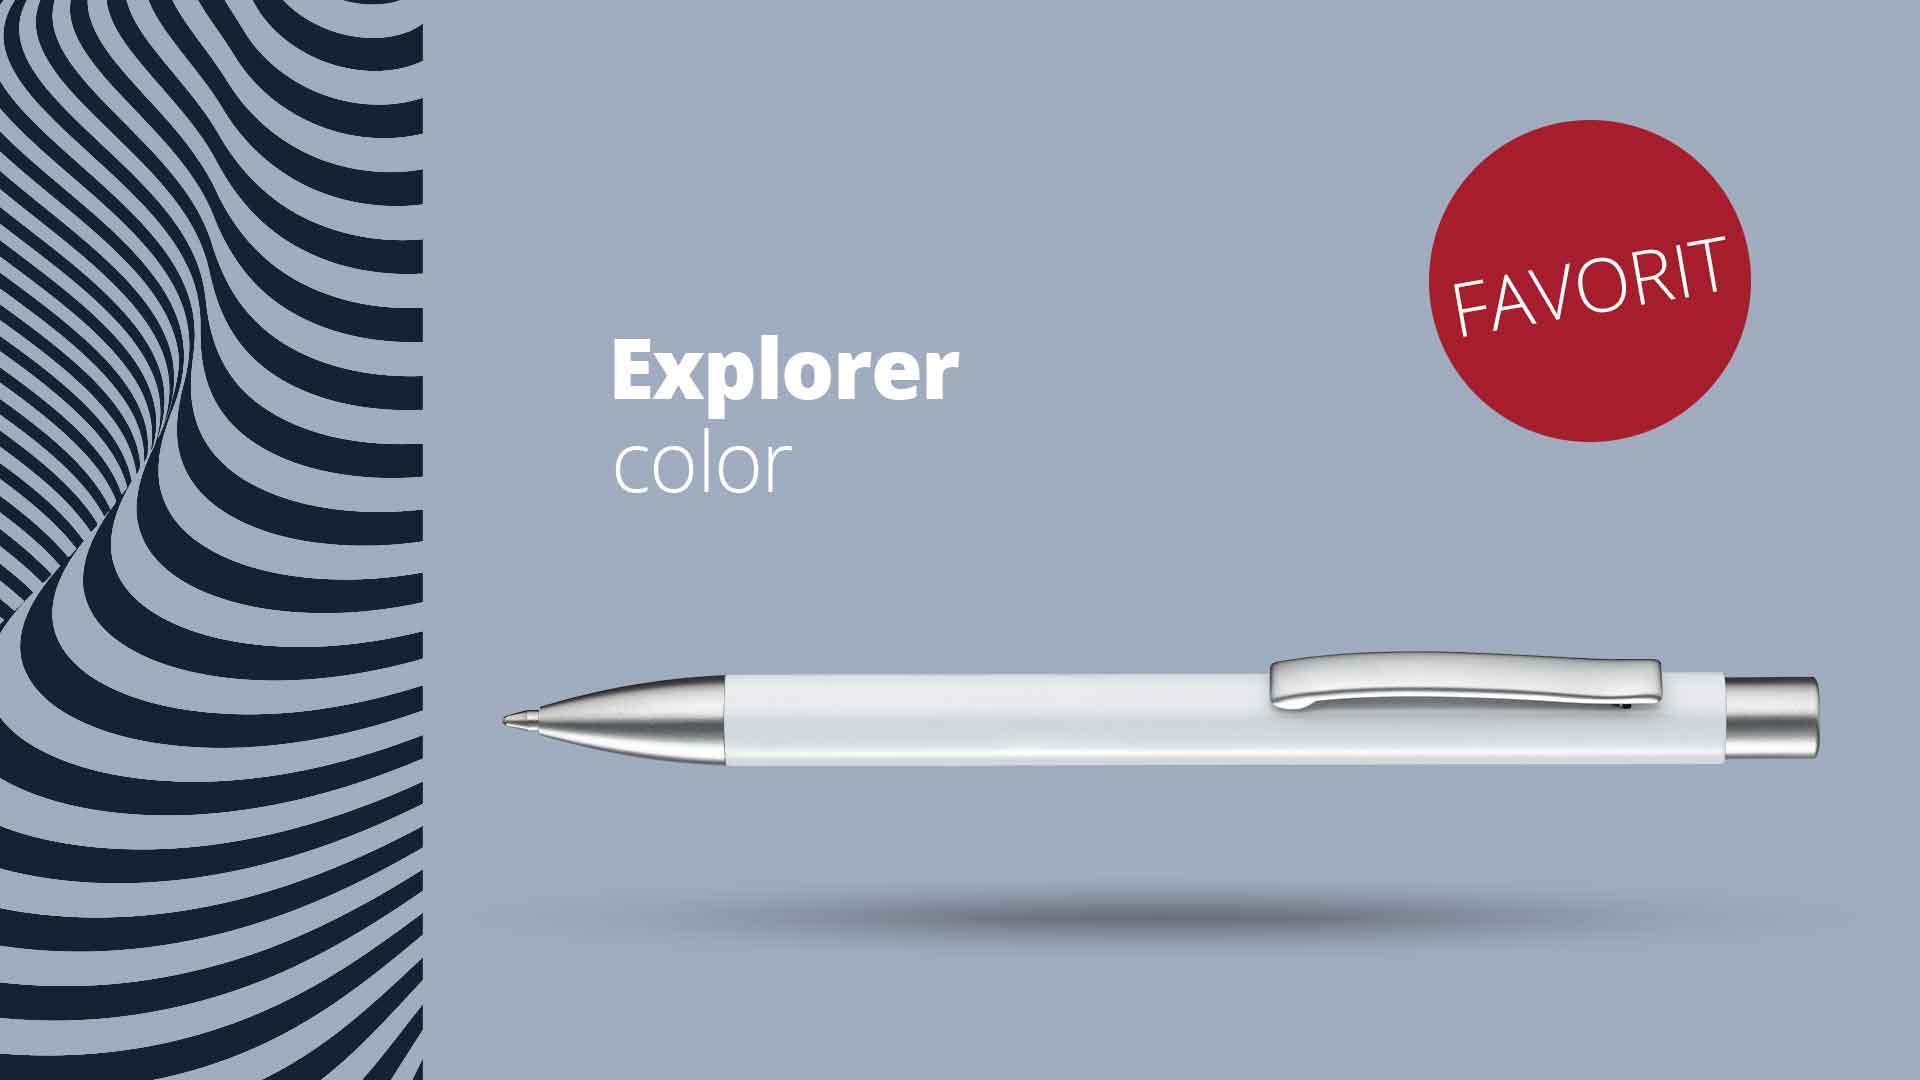 favo_07_explorer_desktop_010